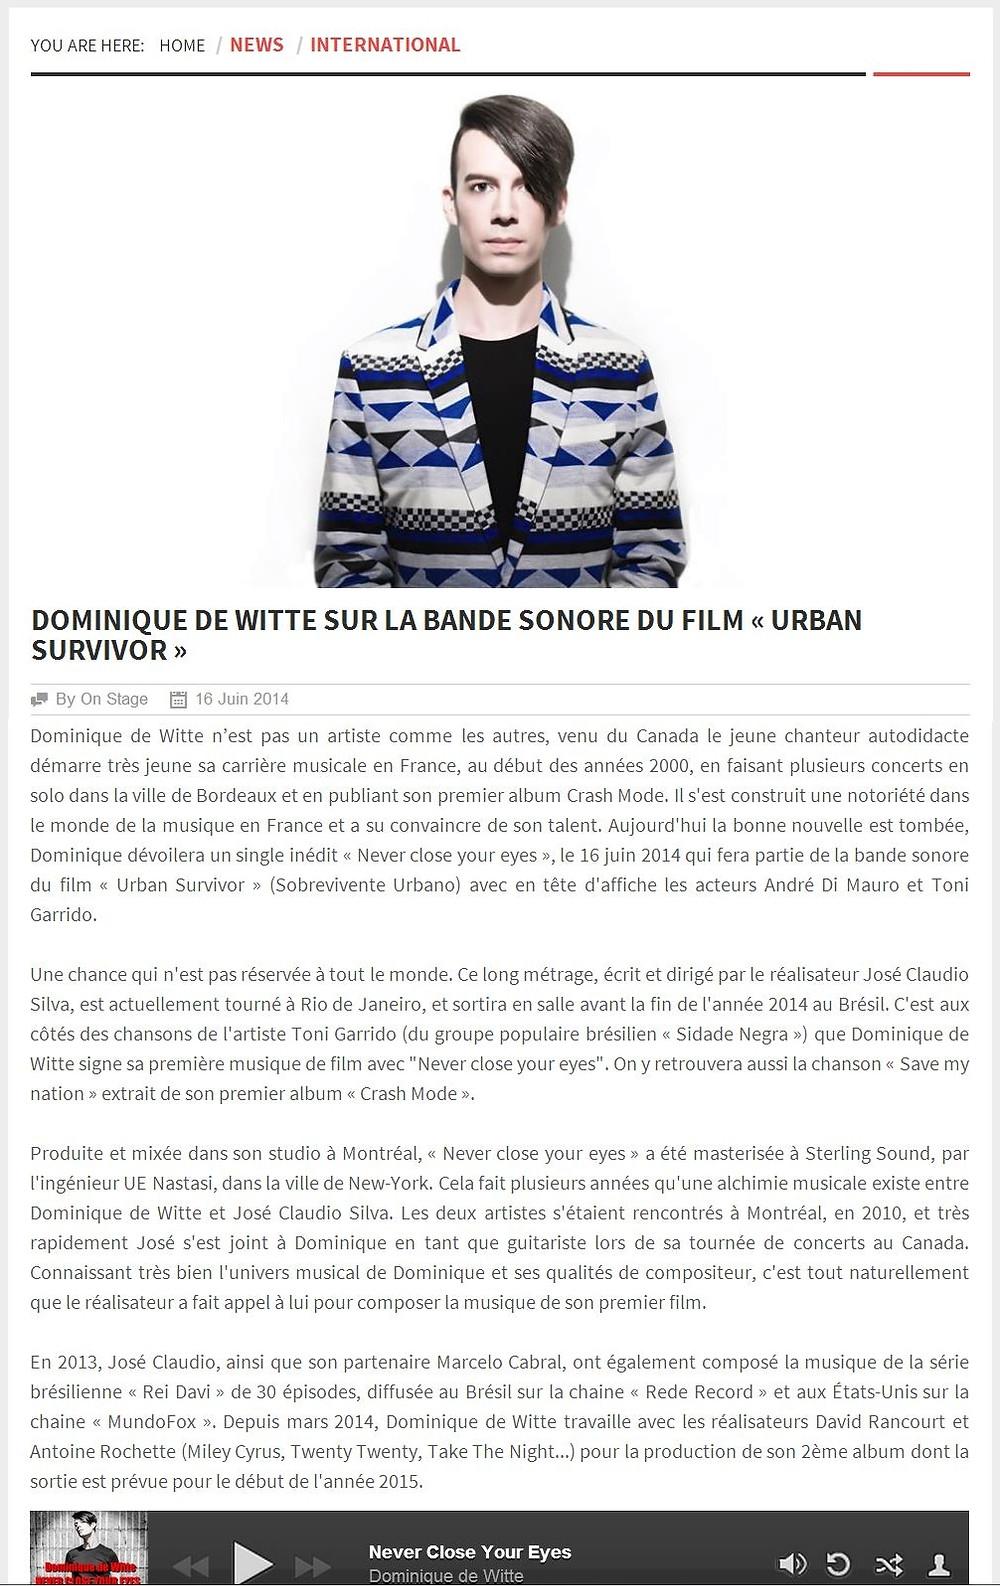 Dominique de Witte - ON STAGE MAGAZINE - 16 juin 2014 Luxembourg